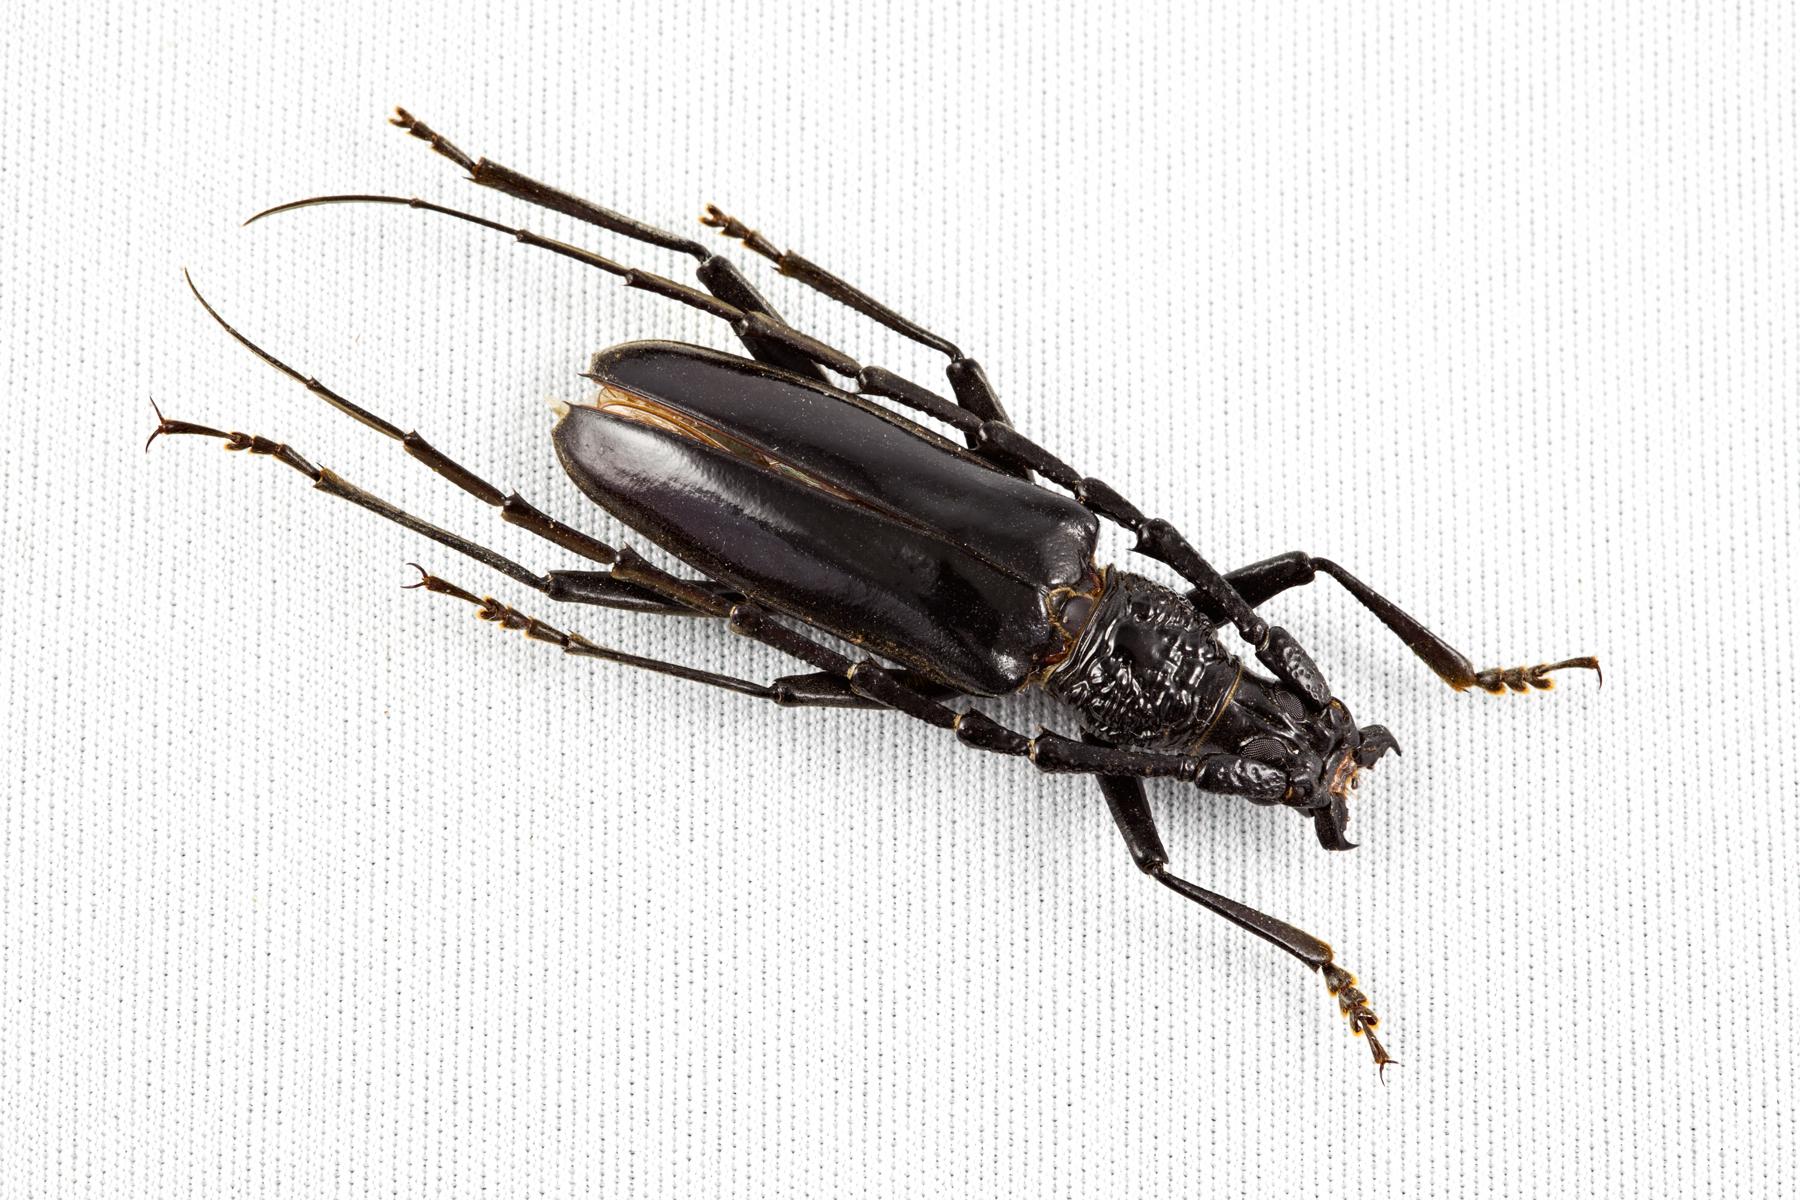 Cerambycidae Beetle, Animal, Insect, Invertebrate, Isolate, HQ Photo